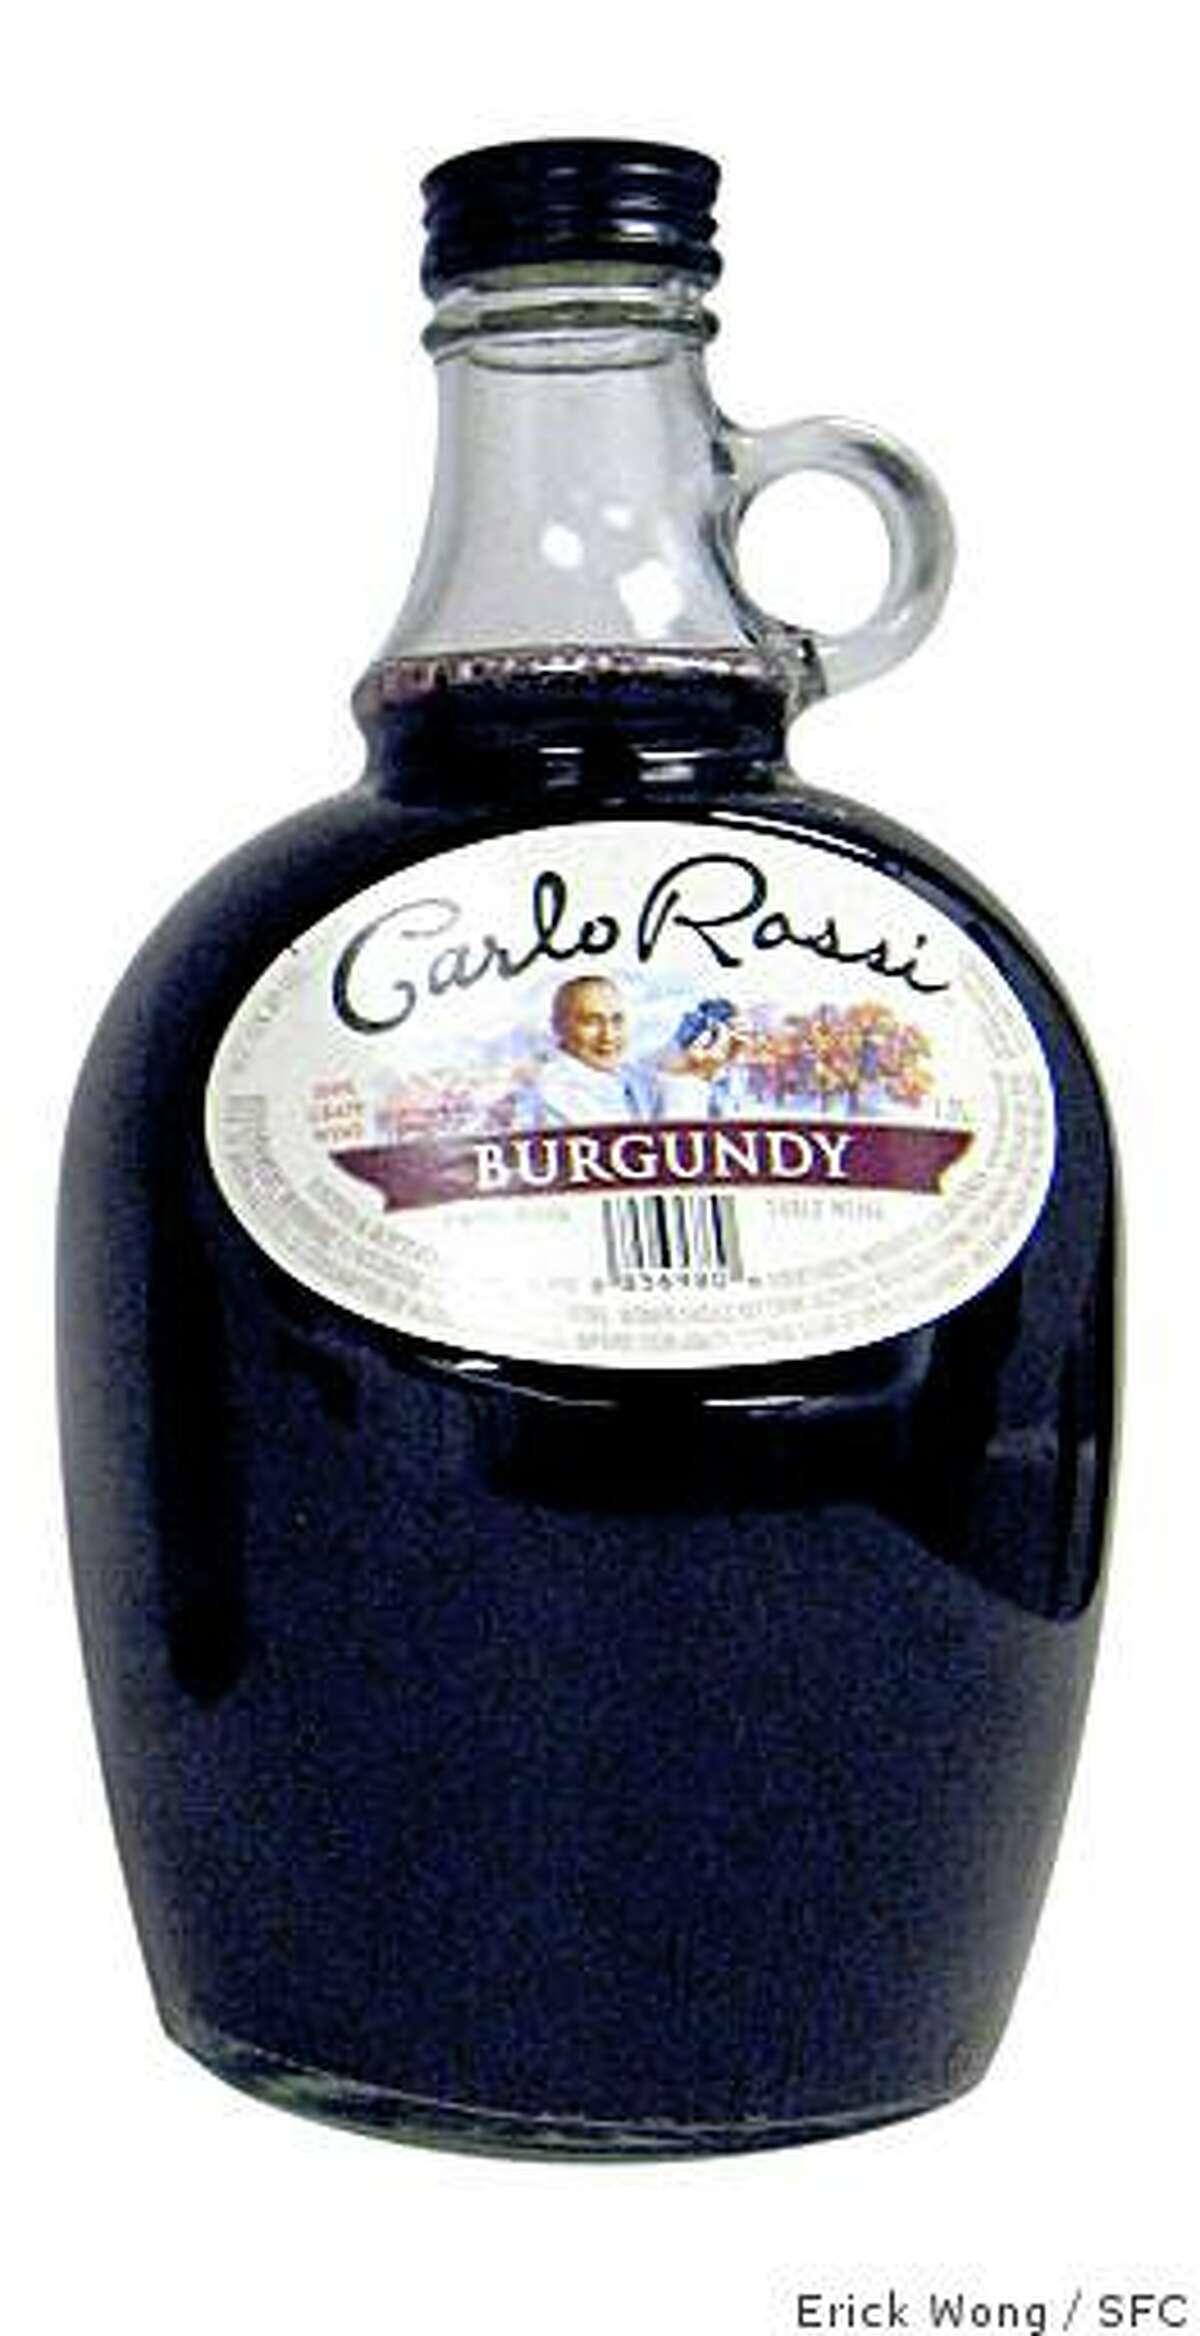 Carlo Rossi Burgundy